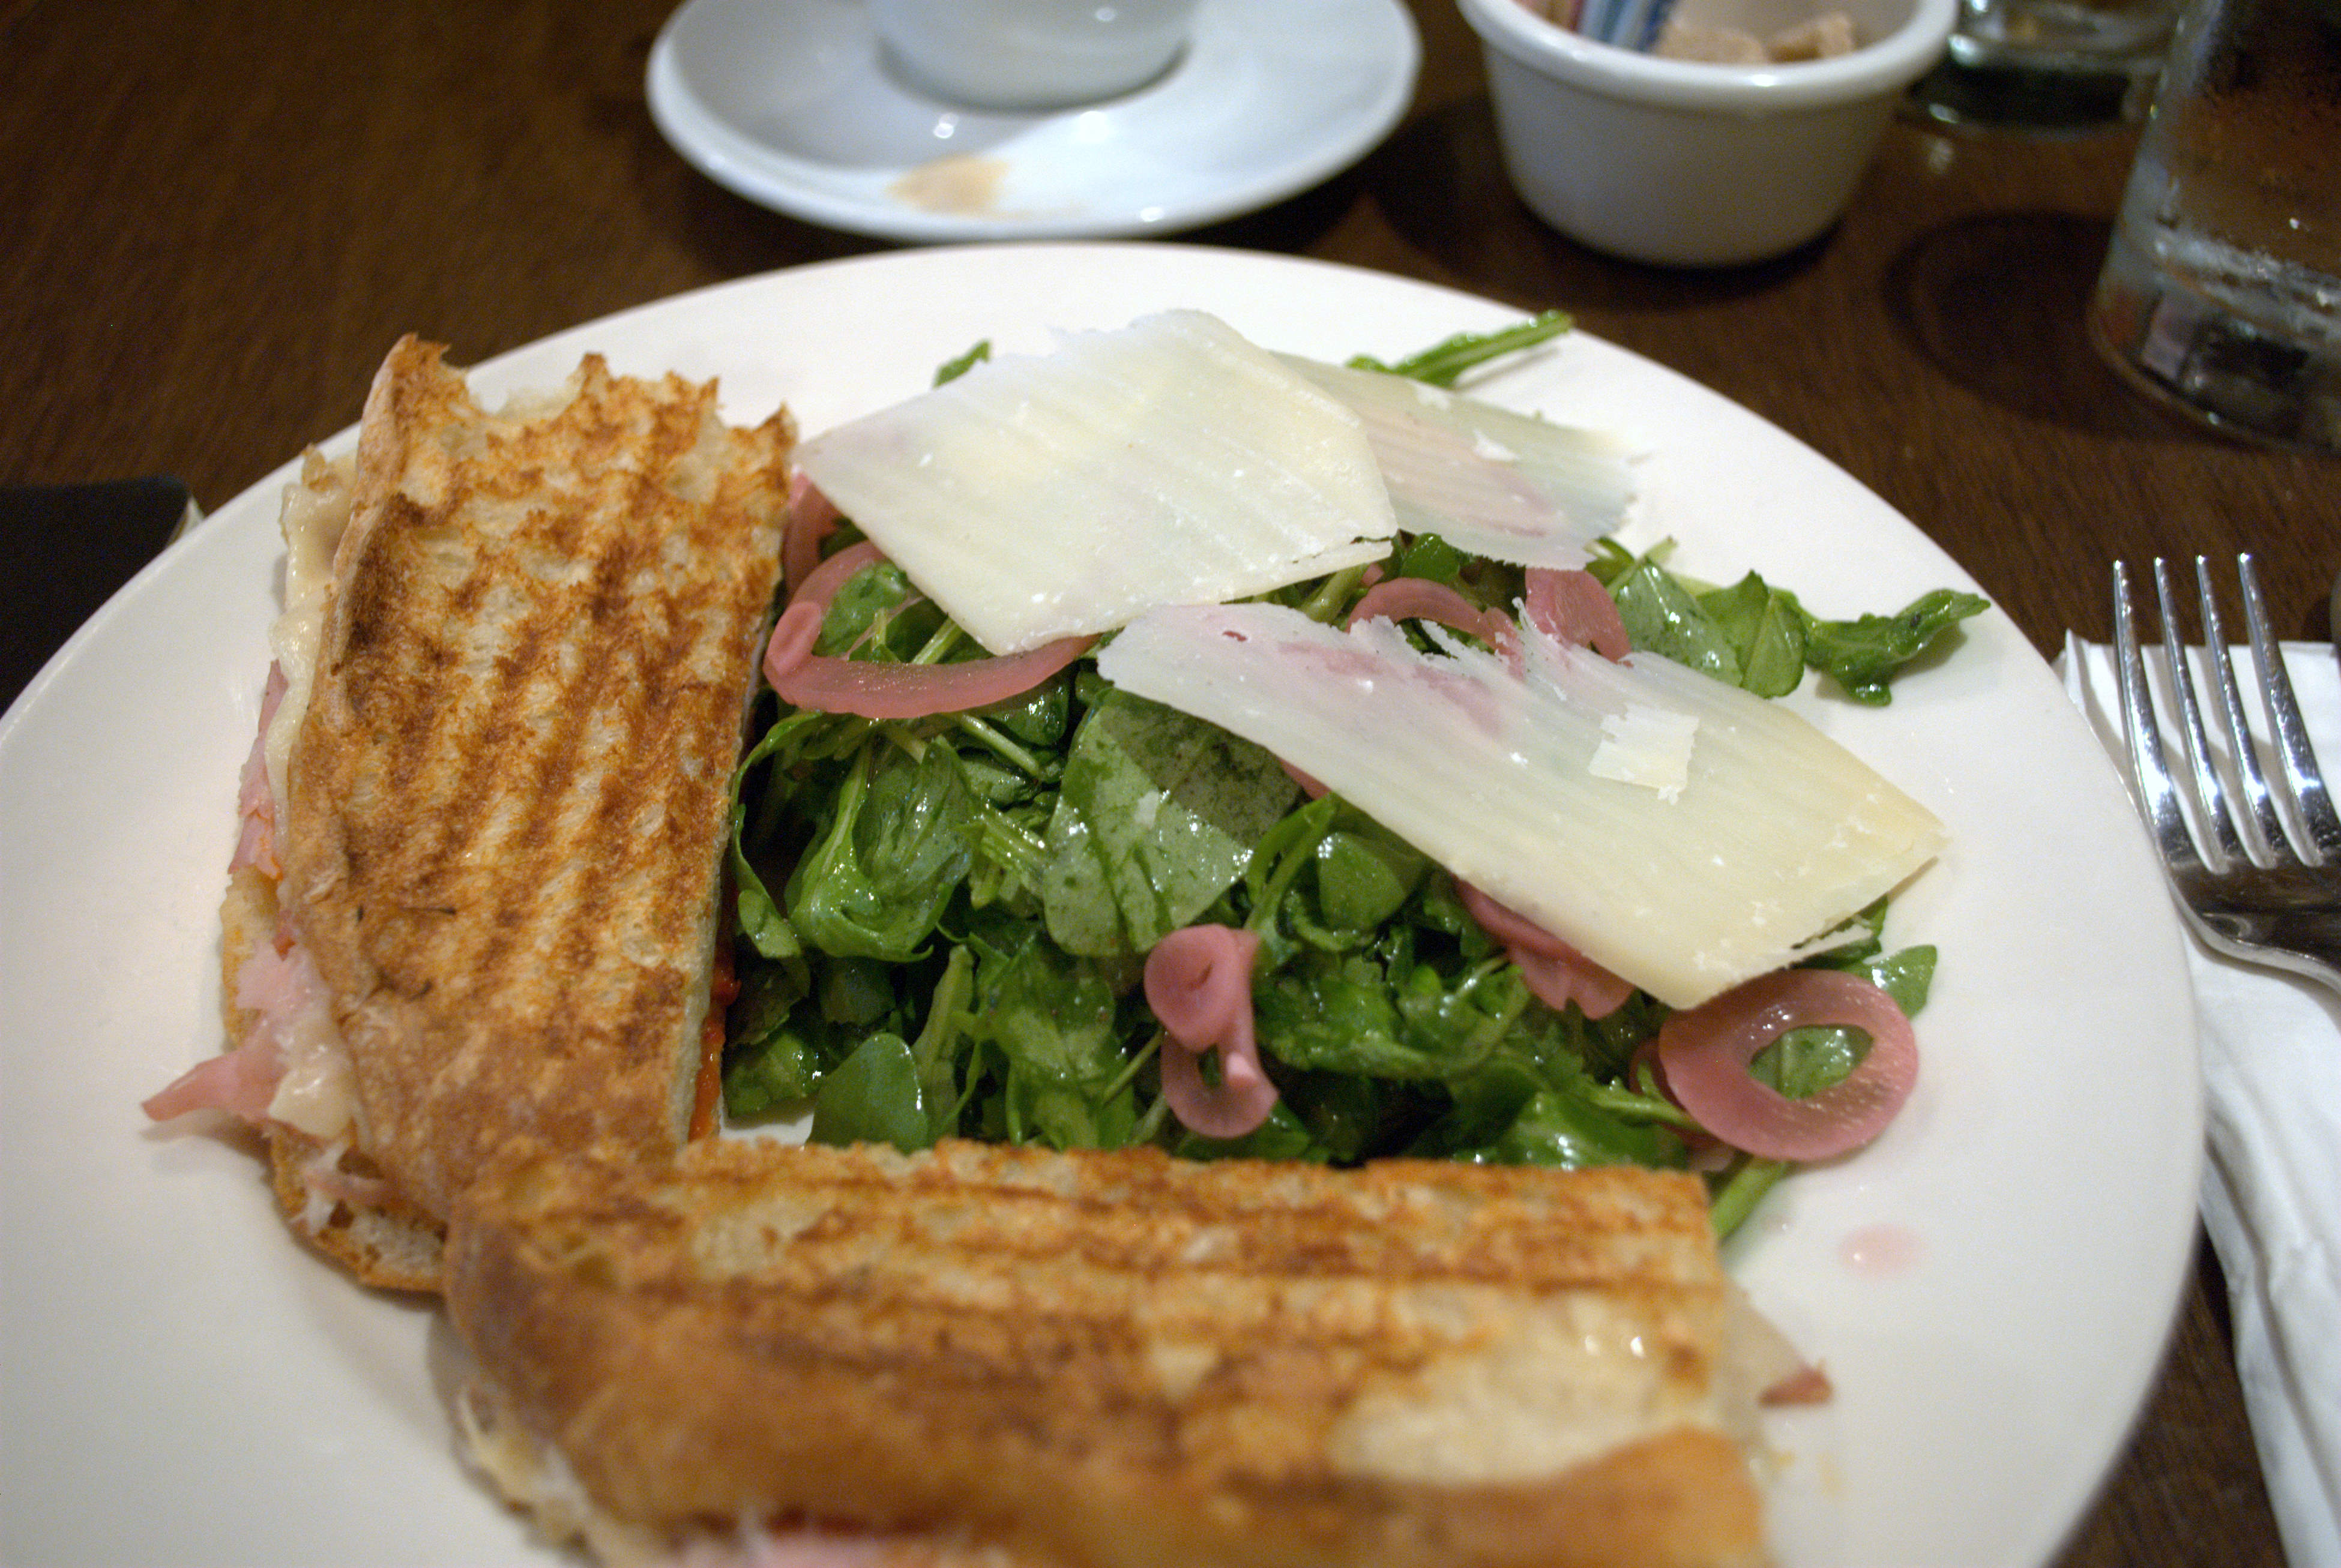 Half panini half salad